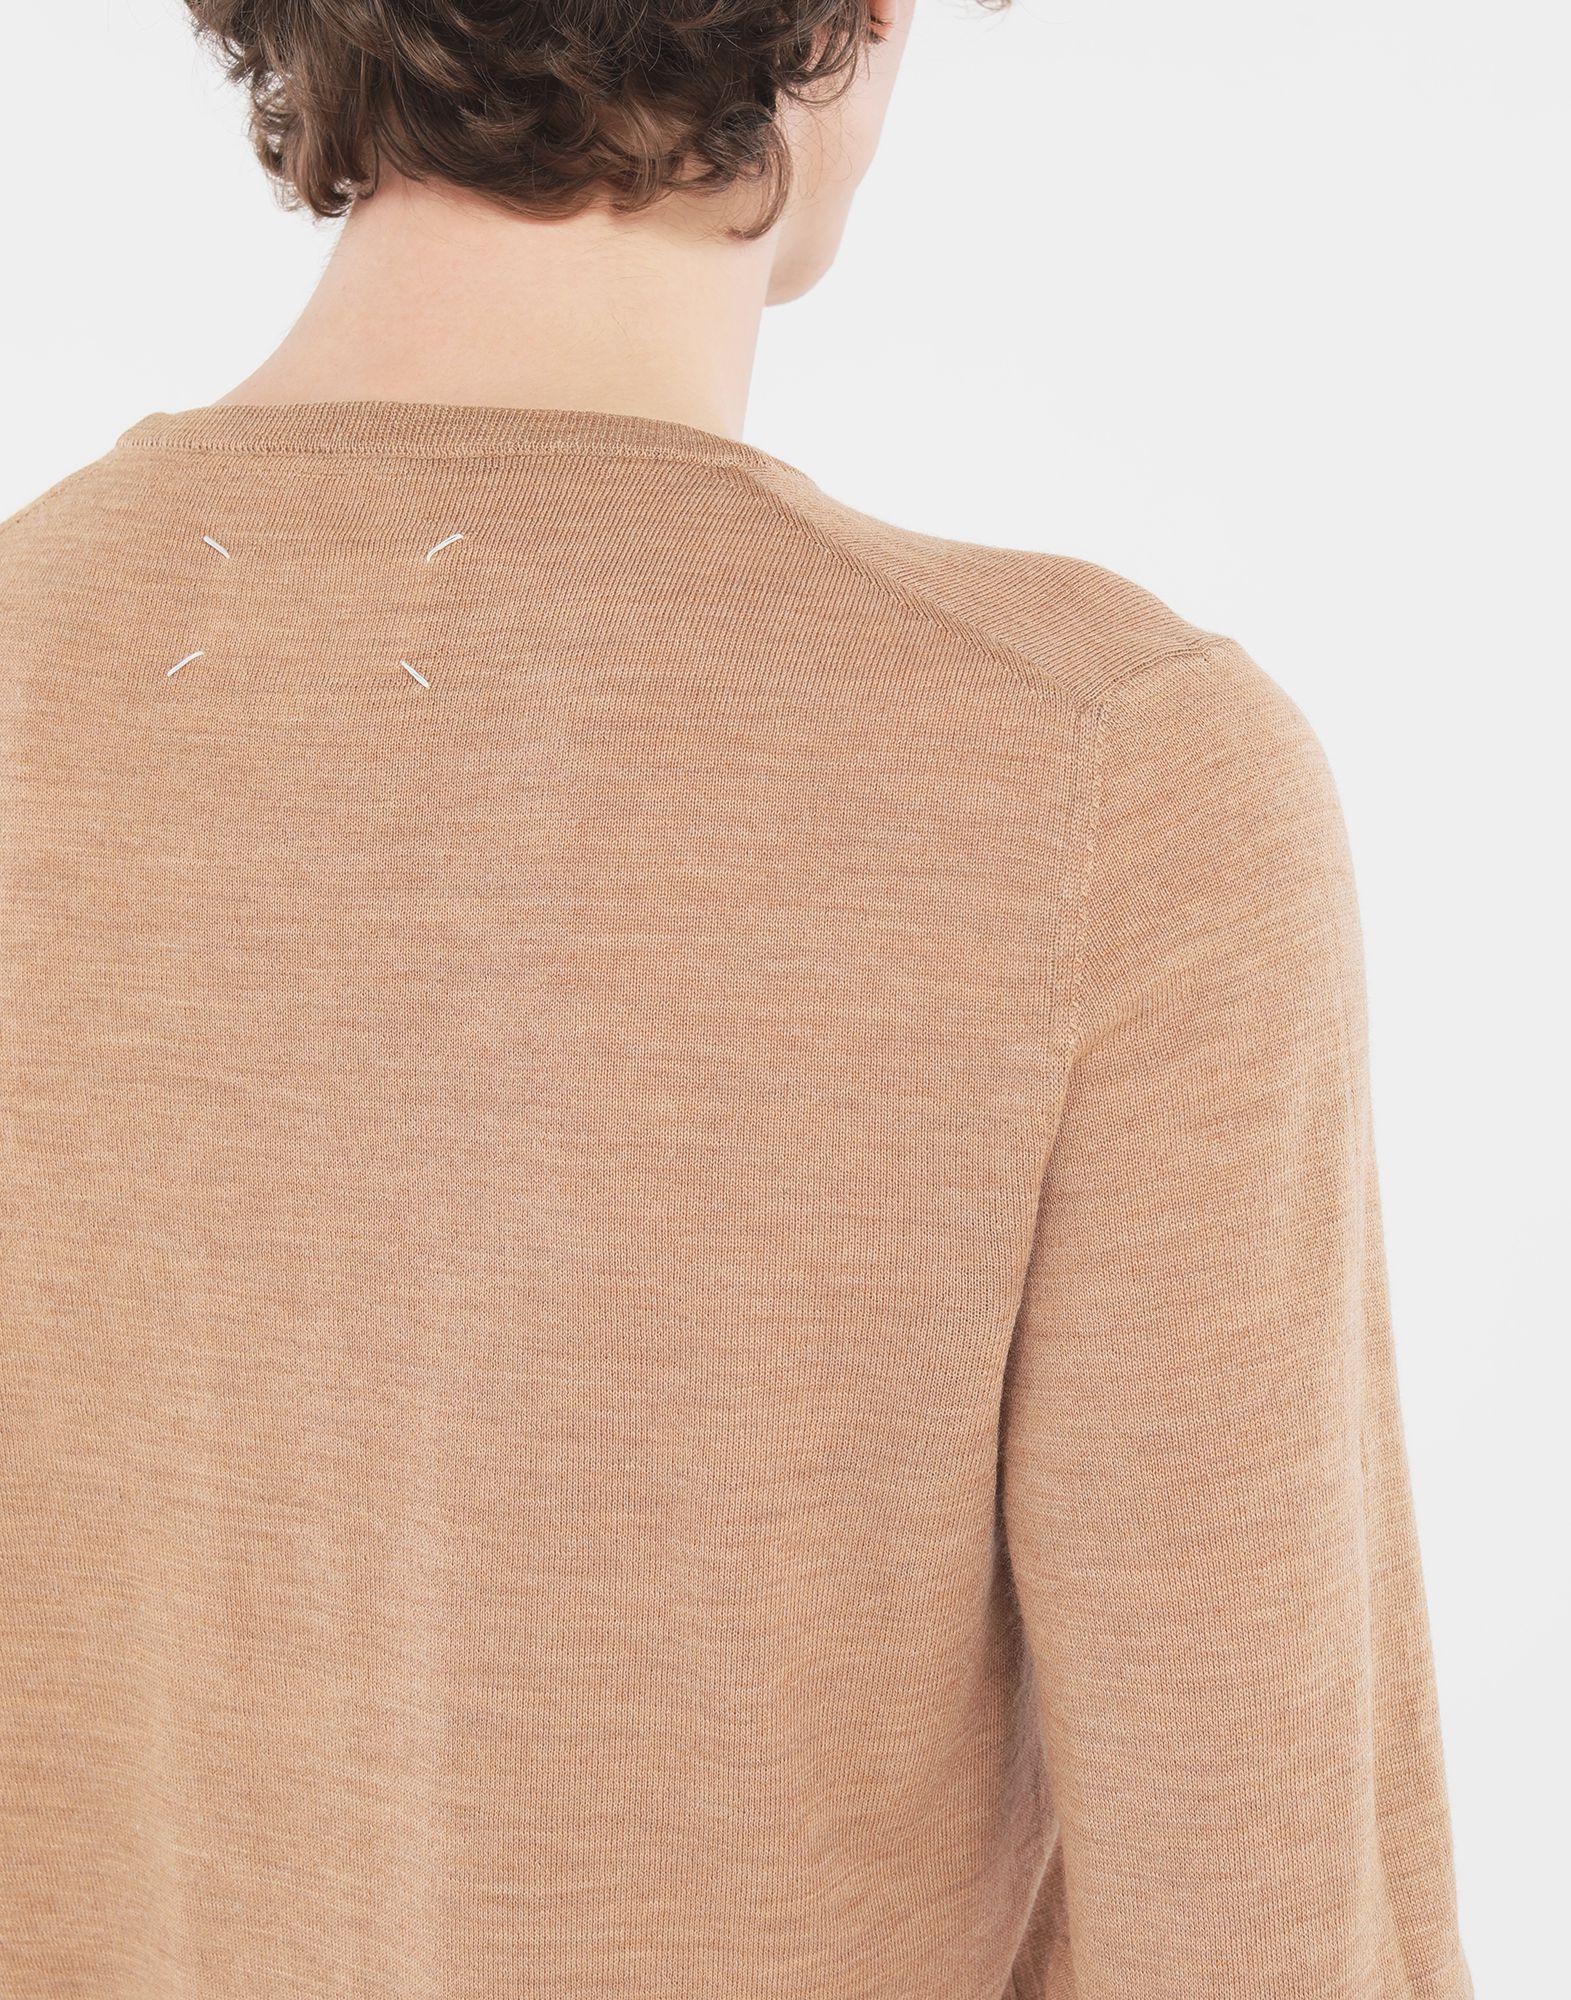 MAISON MARGIELA Wool sweater Crewneck sweater Man b